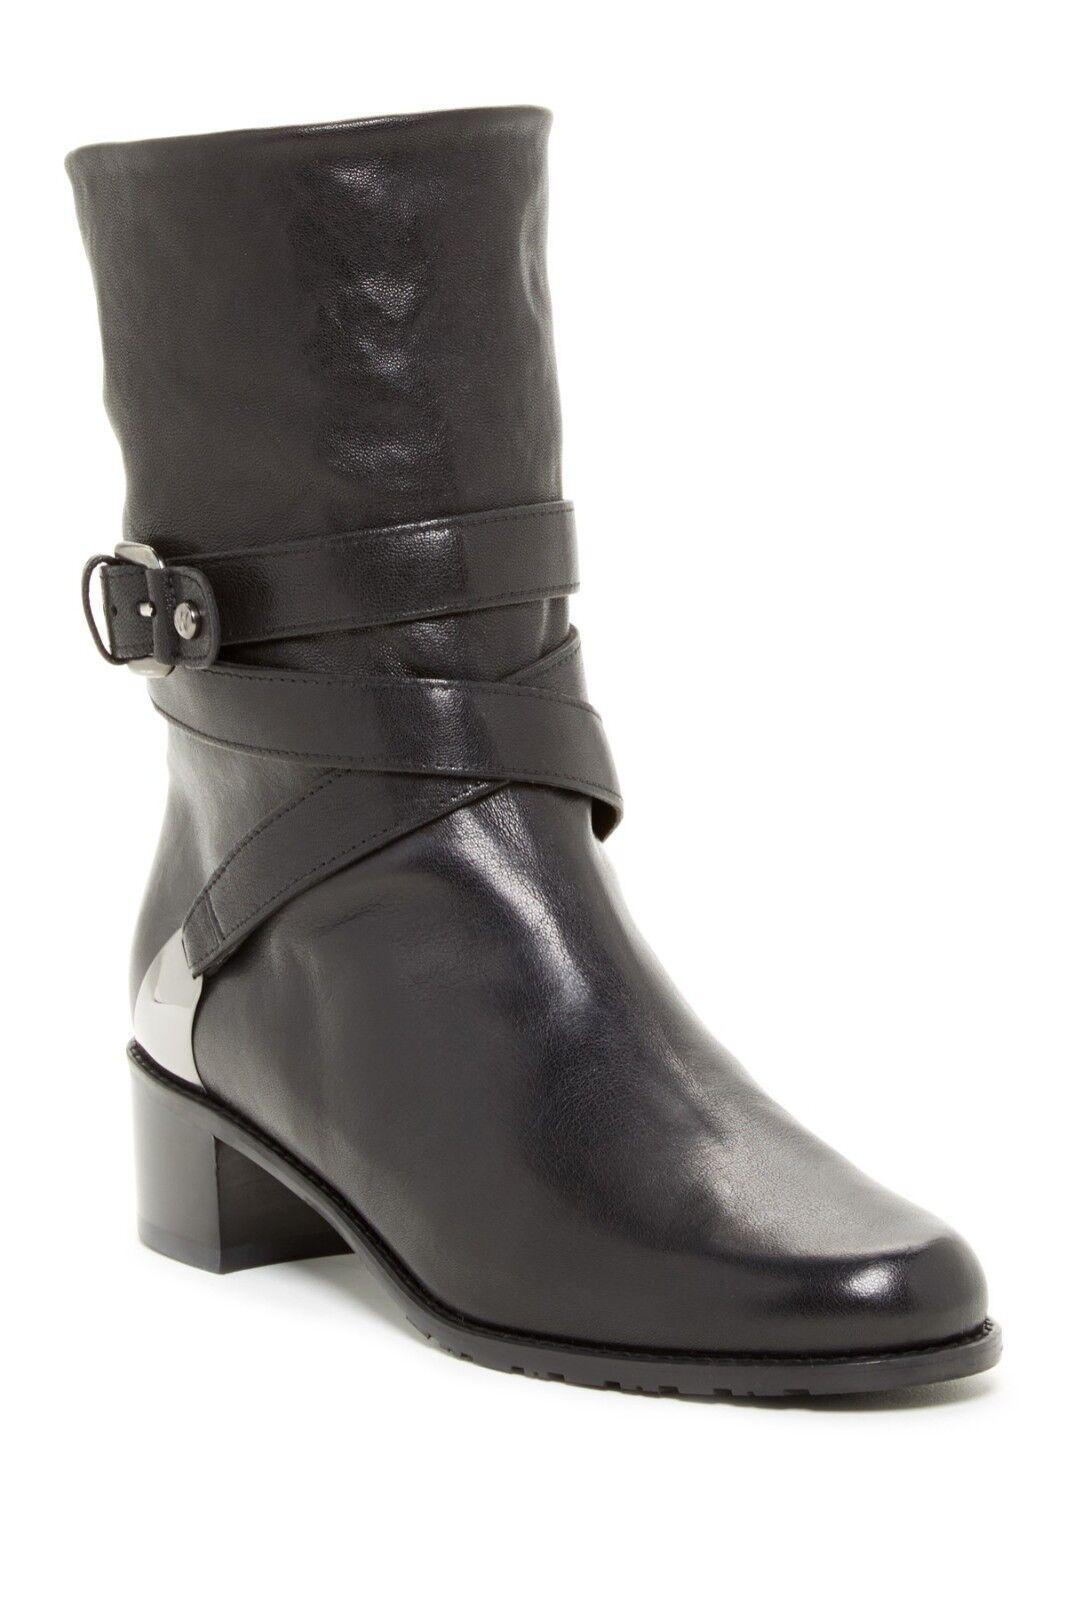 Stuart Weitzman Ranch Dressing Moto Boot - Size 40.5 -  535